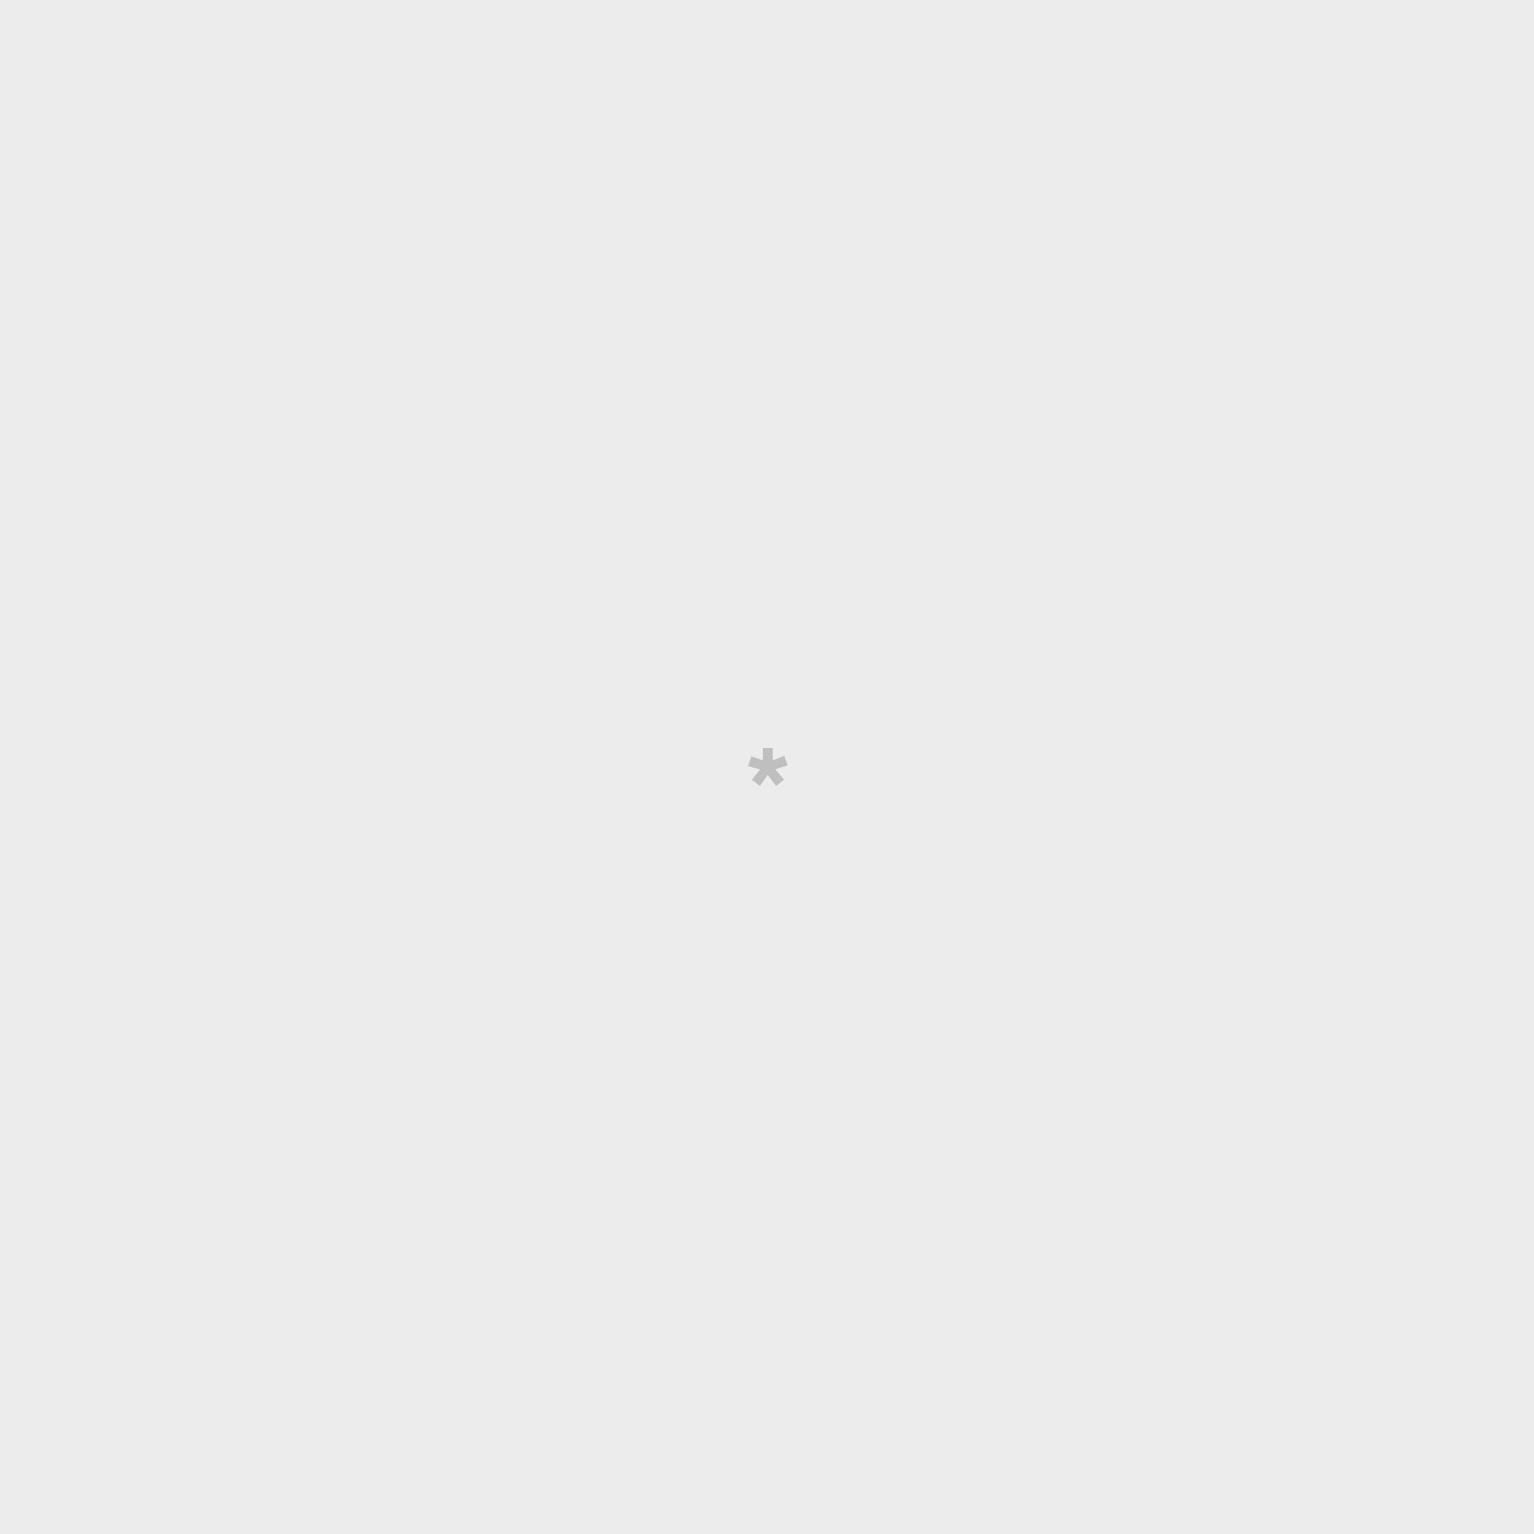 Drawstring backpack - Take me anywhere